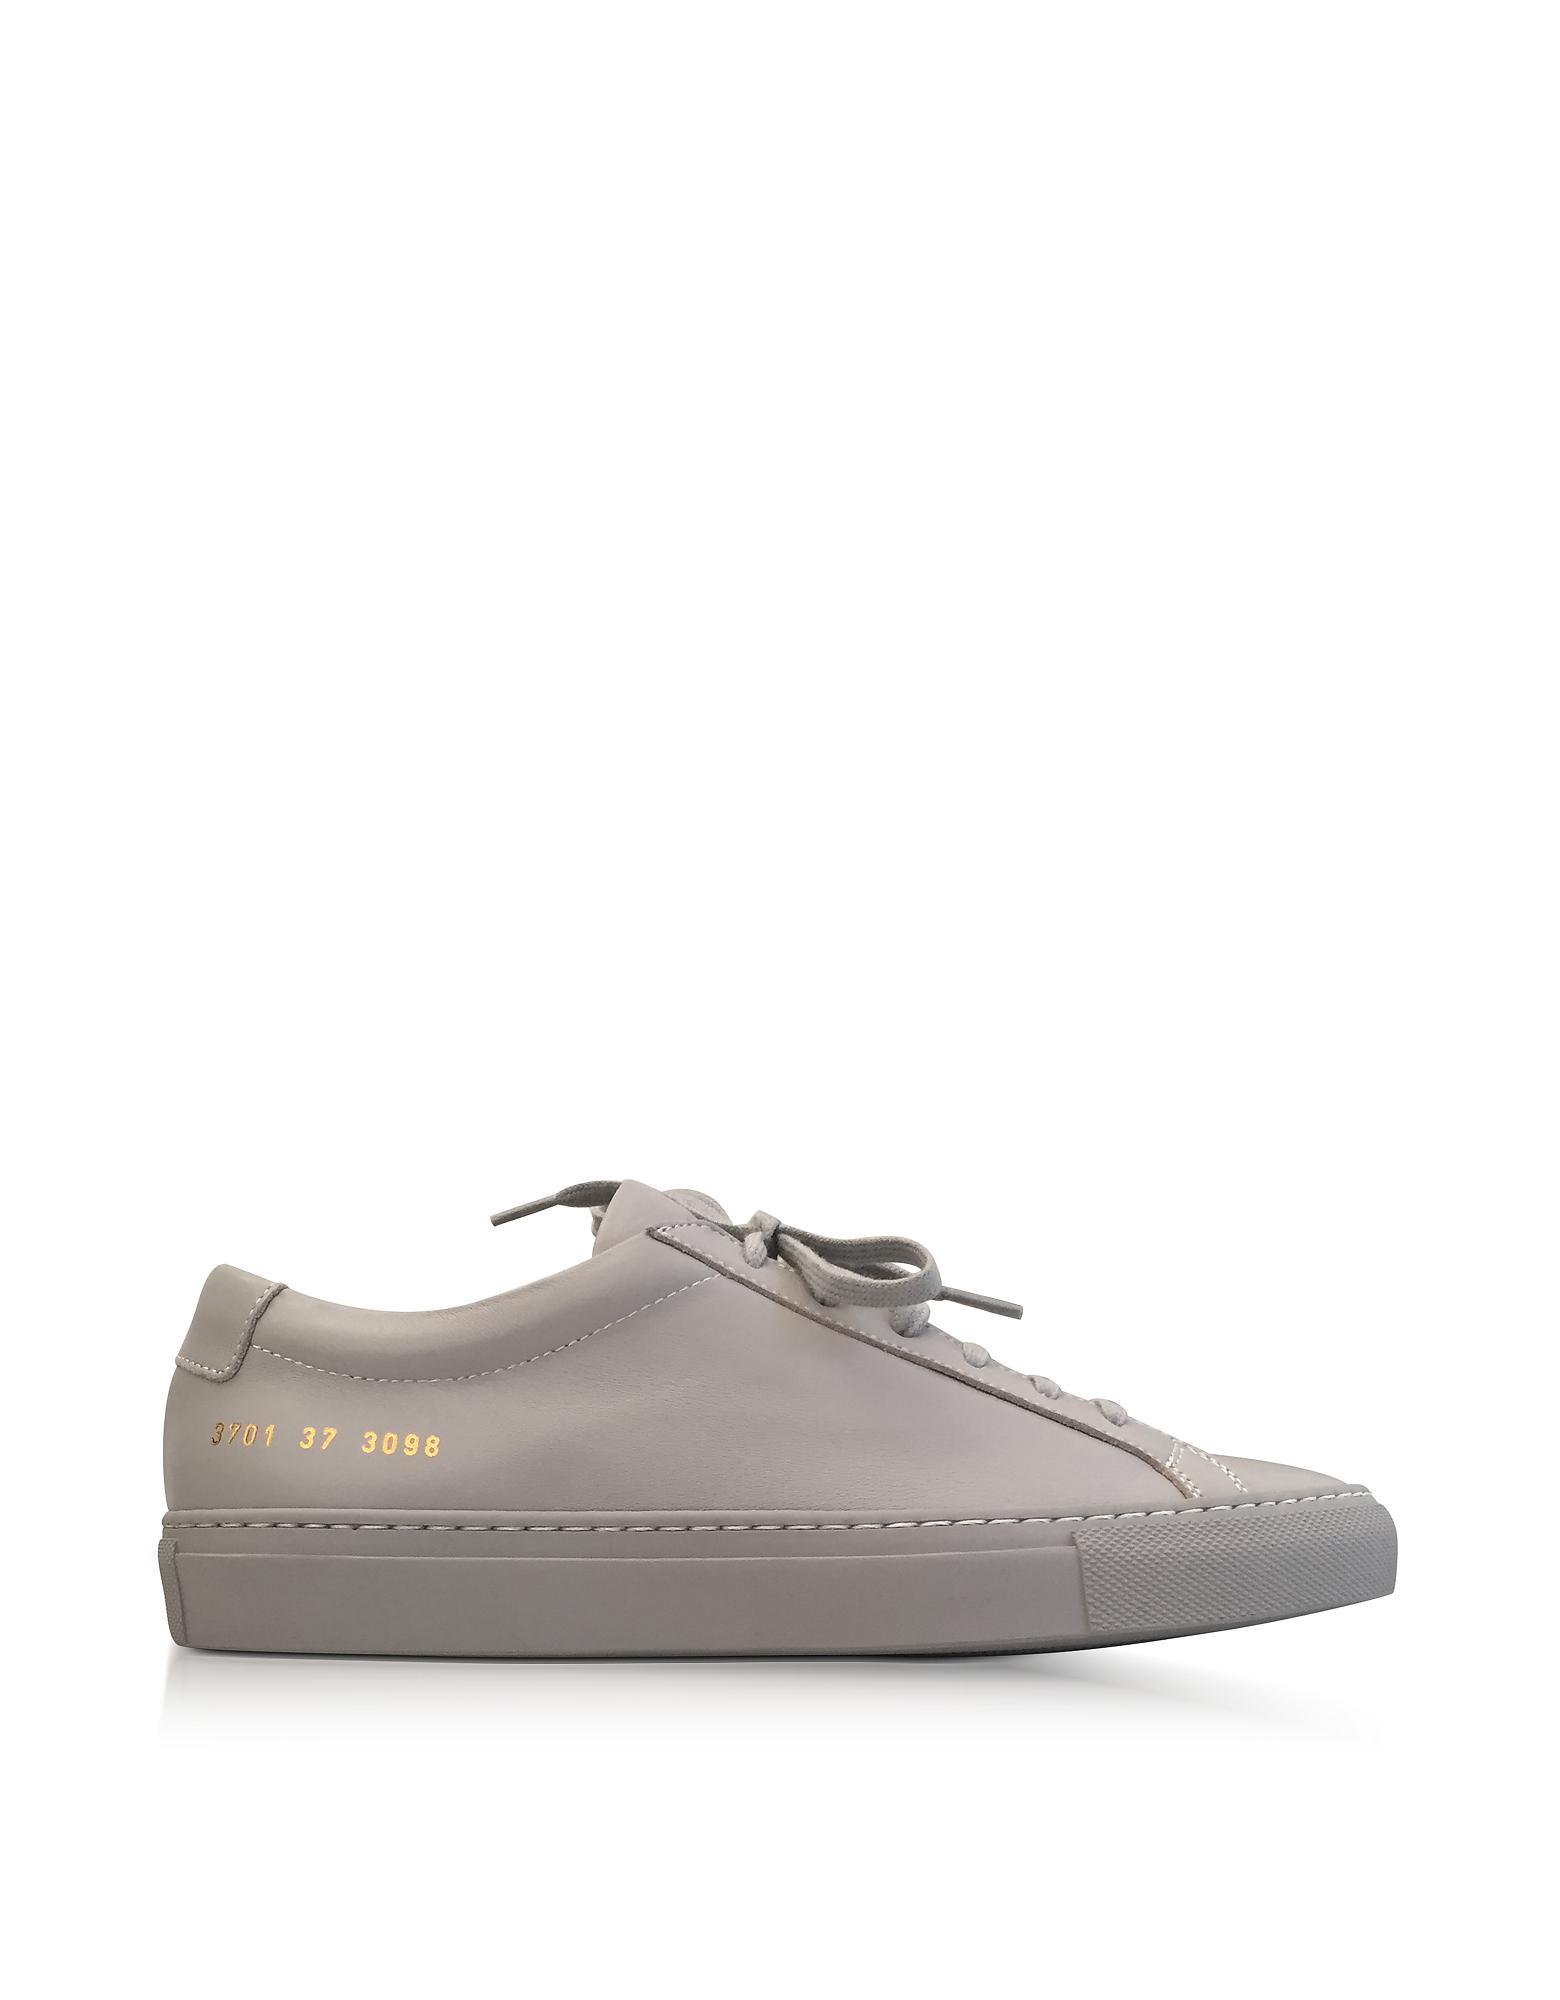 COMMON PROJECTS Designer Shoes, Leather Achilles Original Low Top Women's Sneakers